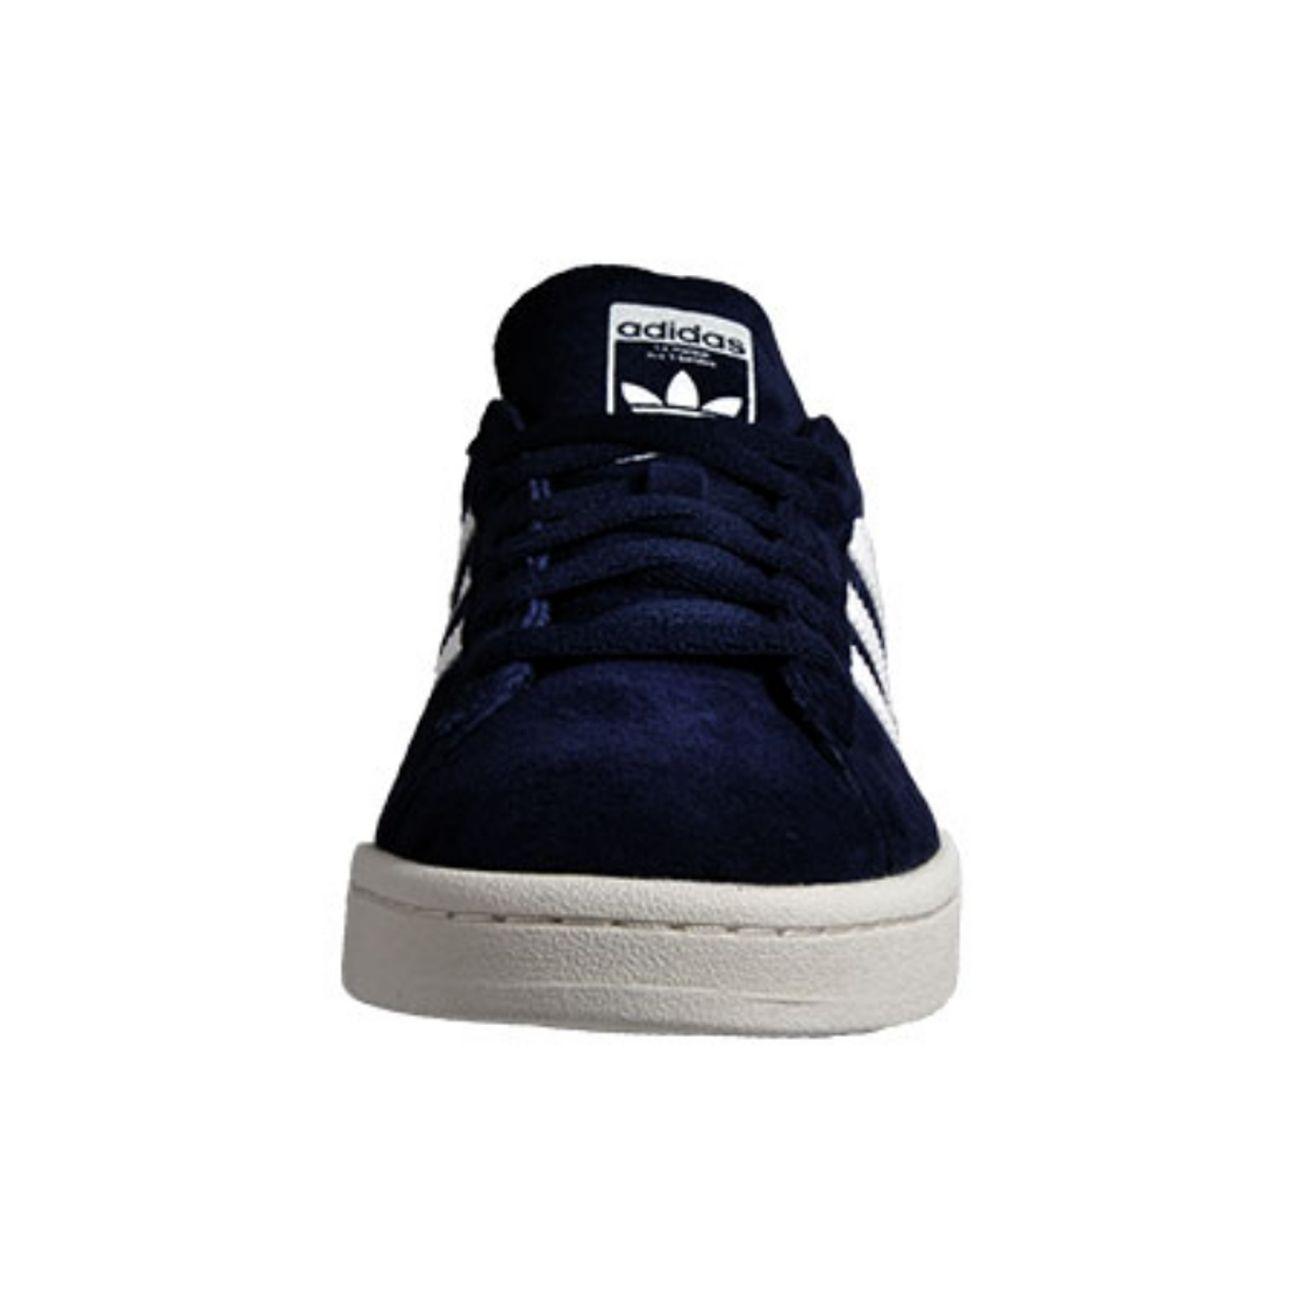 reputable site fc415 d90c6 ... Mode- Lifestyle homme ADIDAS ORIGINALS Basket adidas Originals Campus -  BZ0086